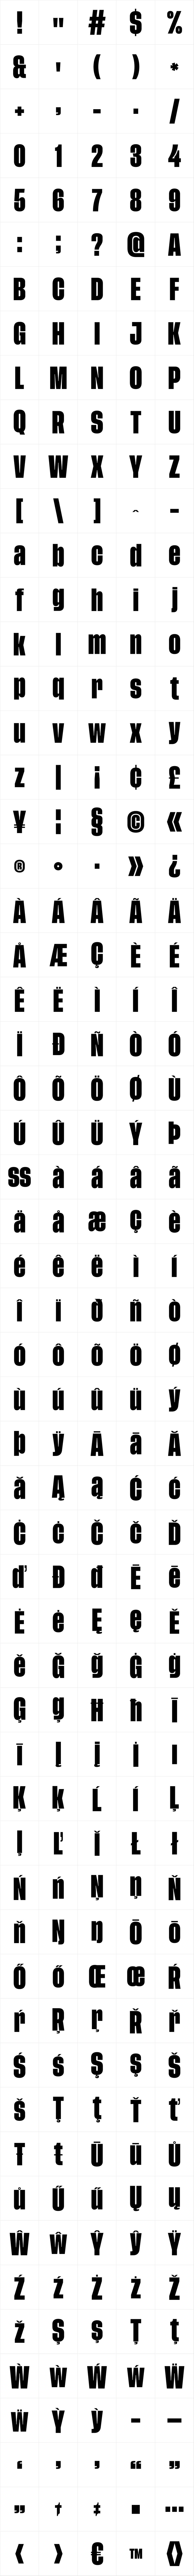 Tusker Grotesk 5700 Bold